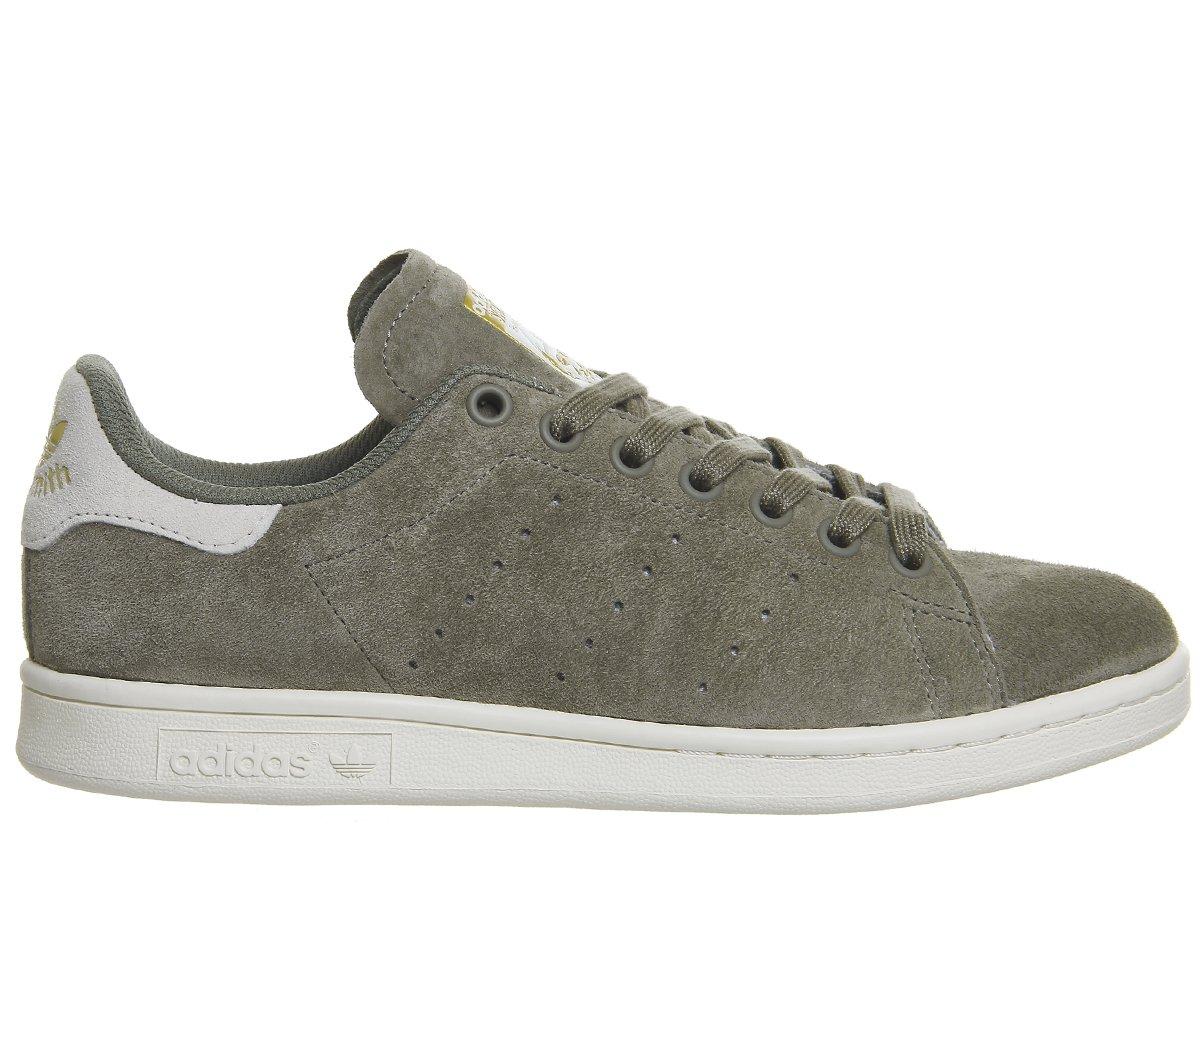 Adidas Originals Stan Smith Cream Damen Tennisschuhe Trace Cargo Cream Smith Exclusive 69ae73